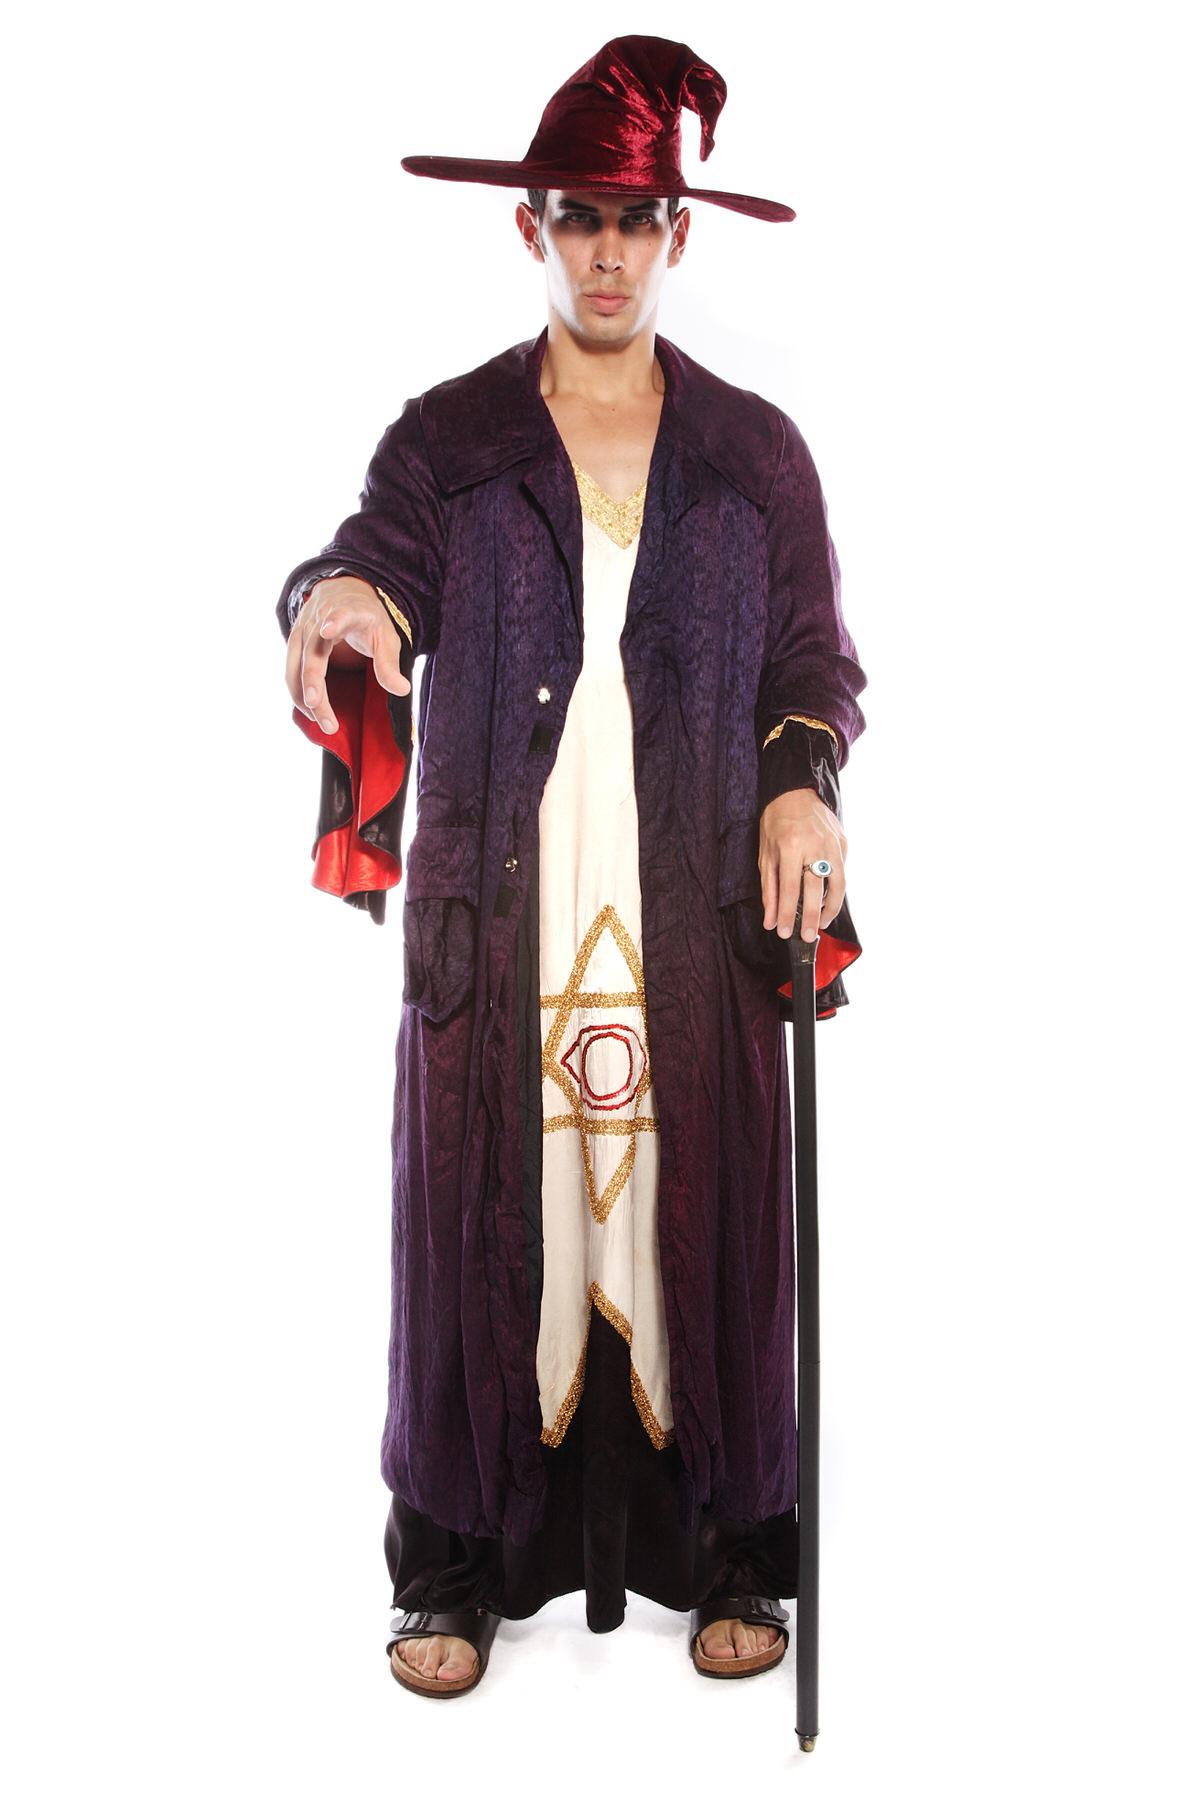 MAGICIAN WIZARD SORCERER LONG COSTUME